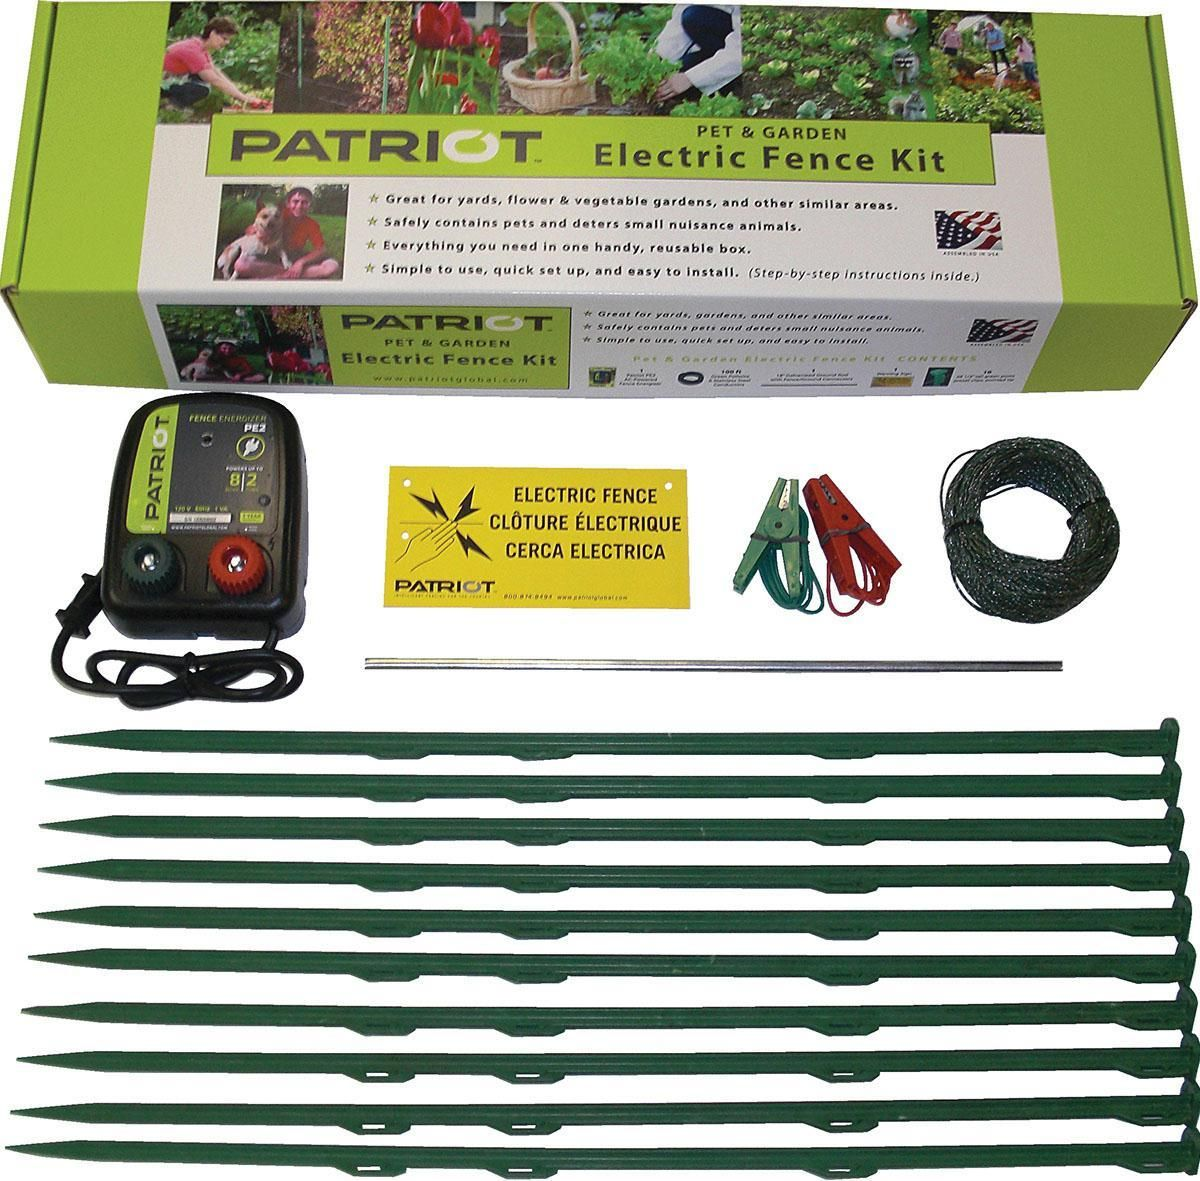 Patriot Pet Garden Electric Fence Kit Garden Kits Electric